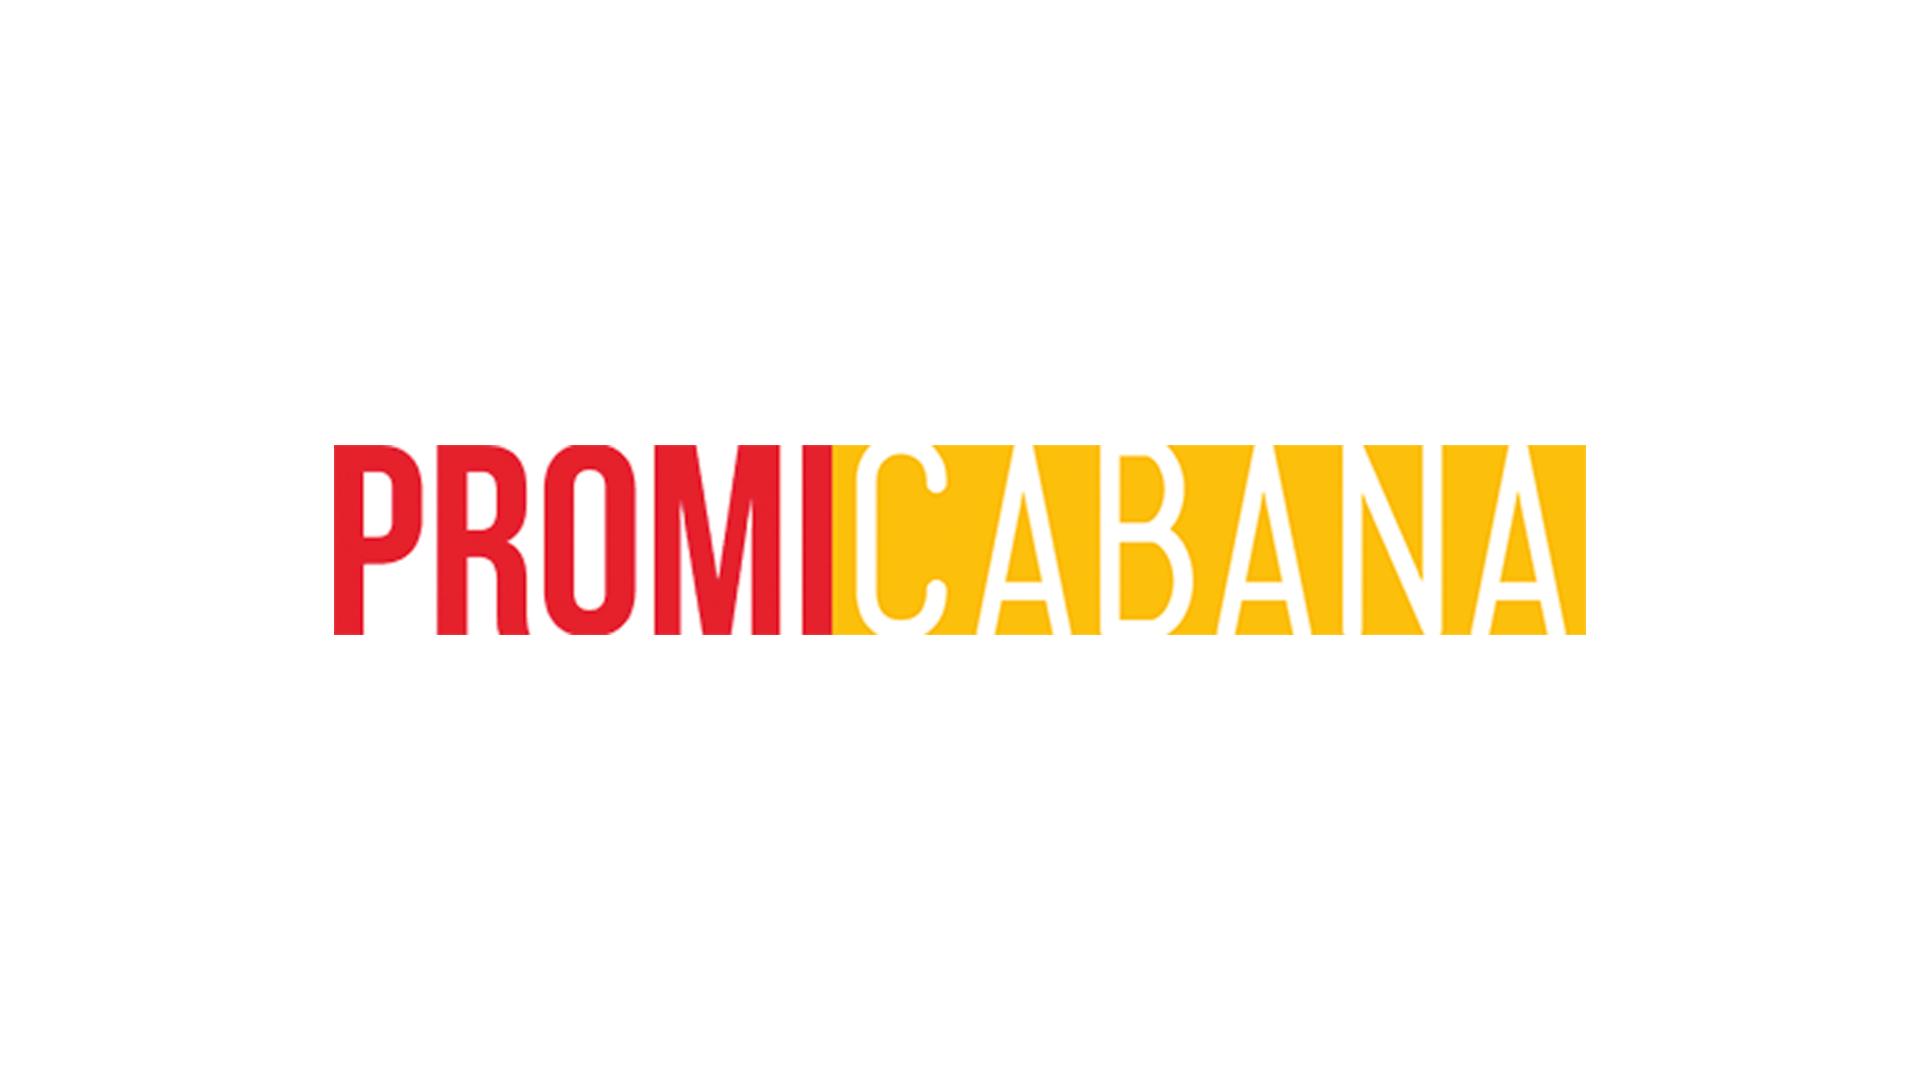 Justin-Bieber-Bat-Bike-Geburtstag